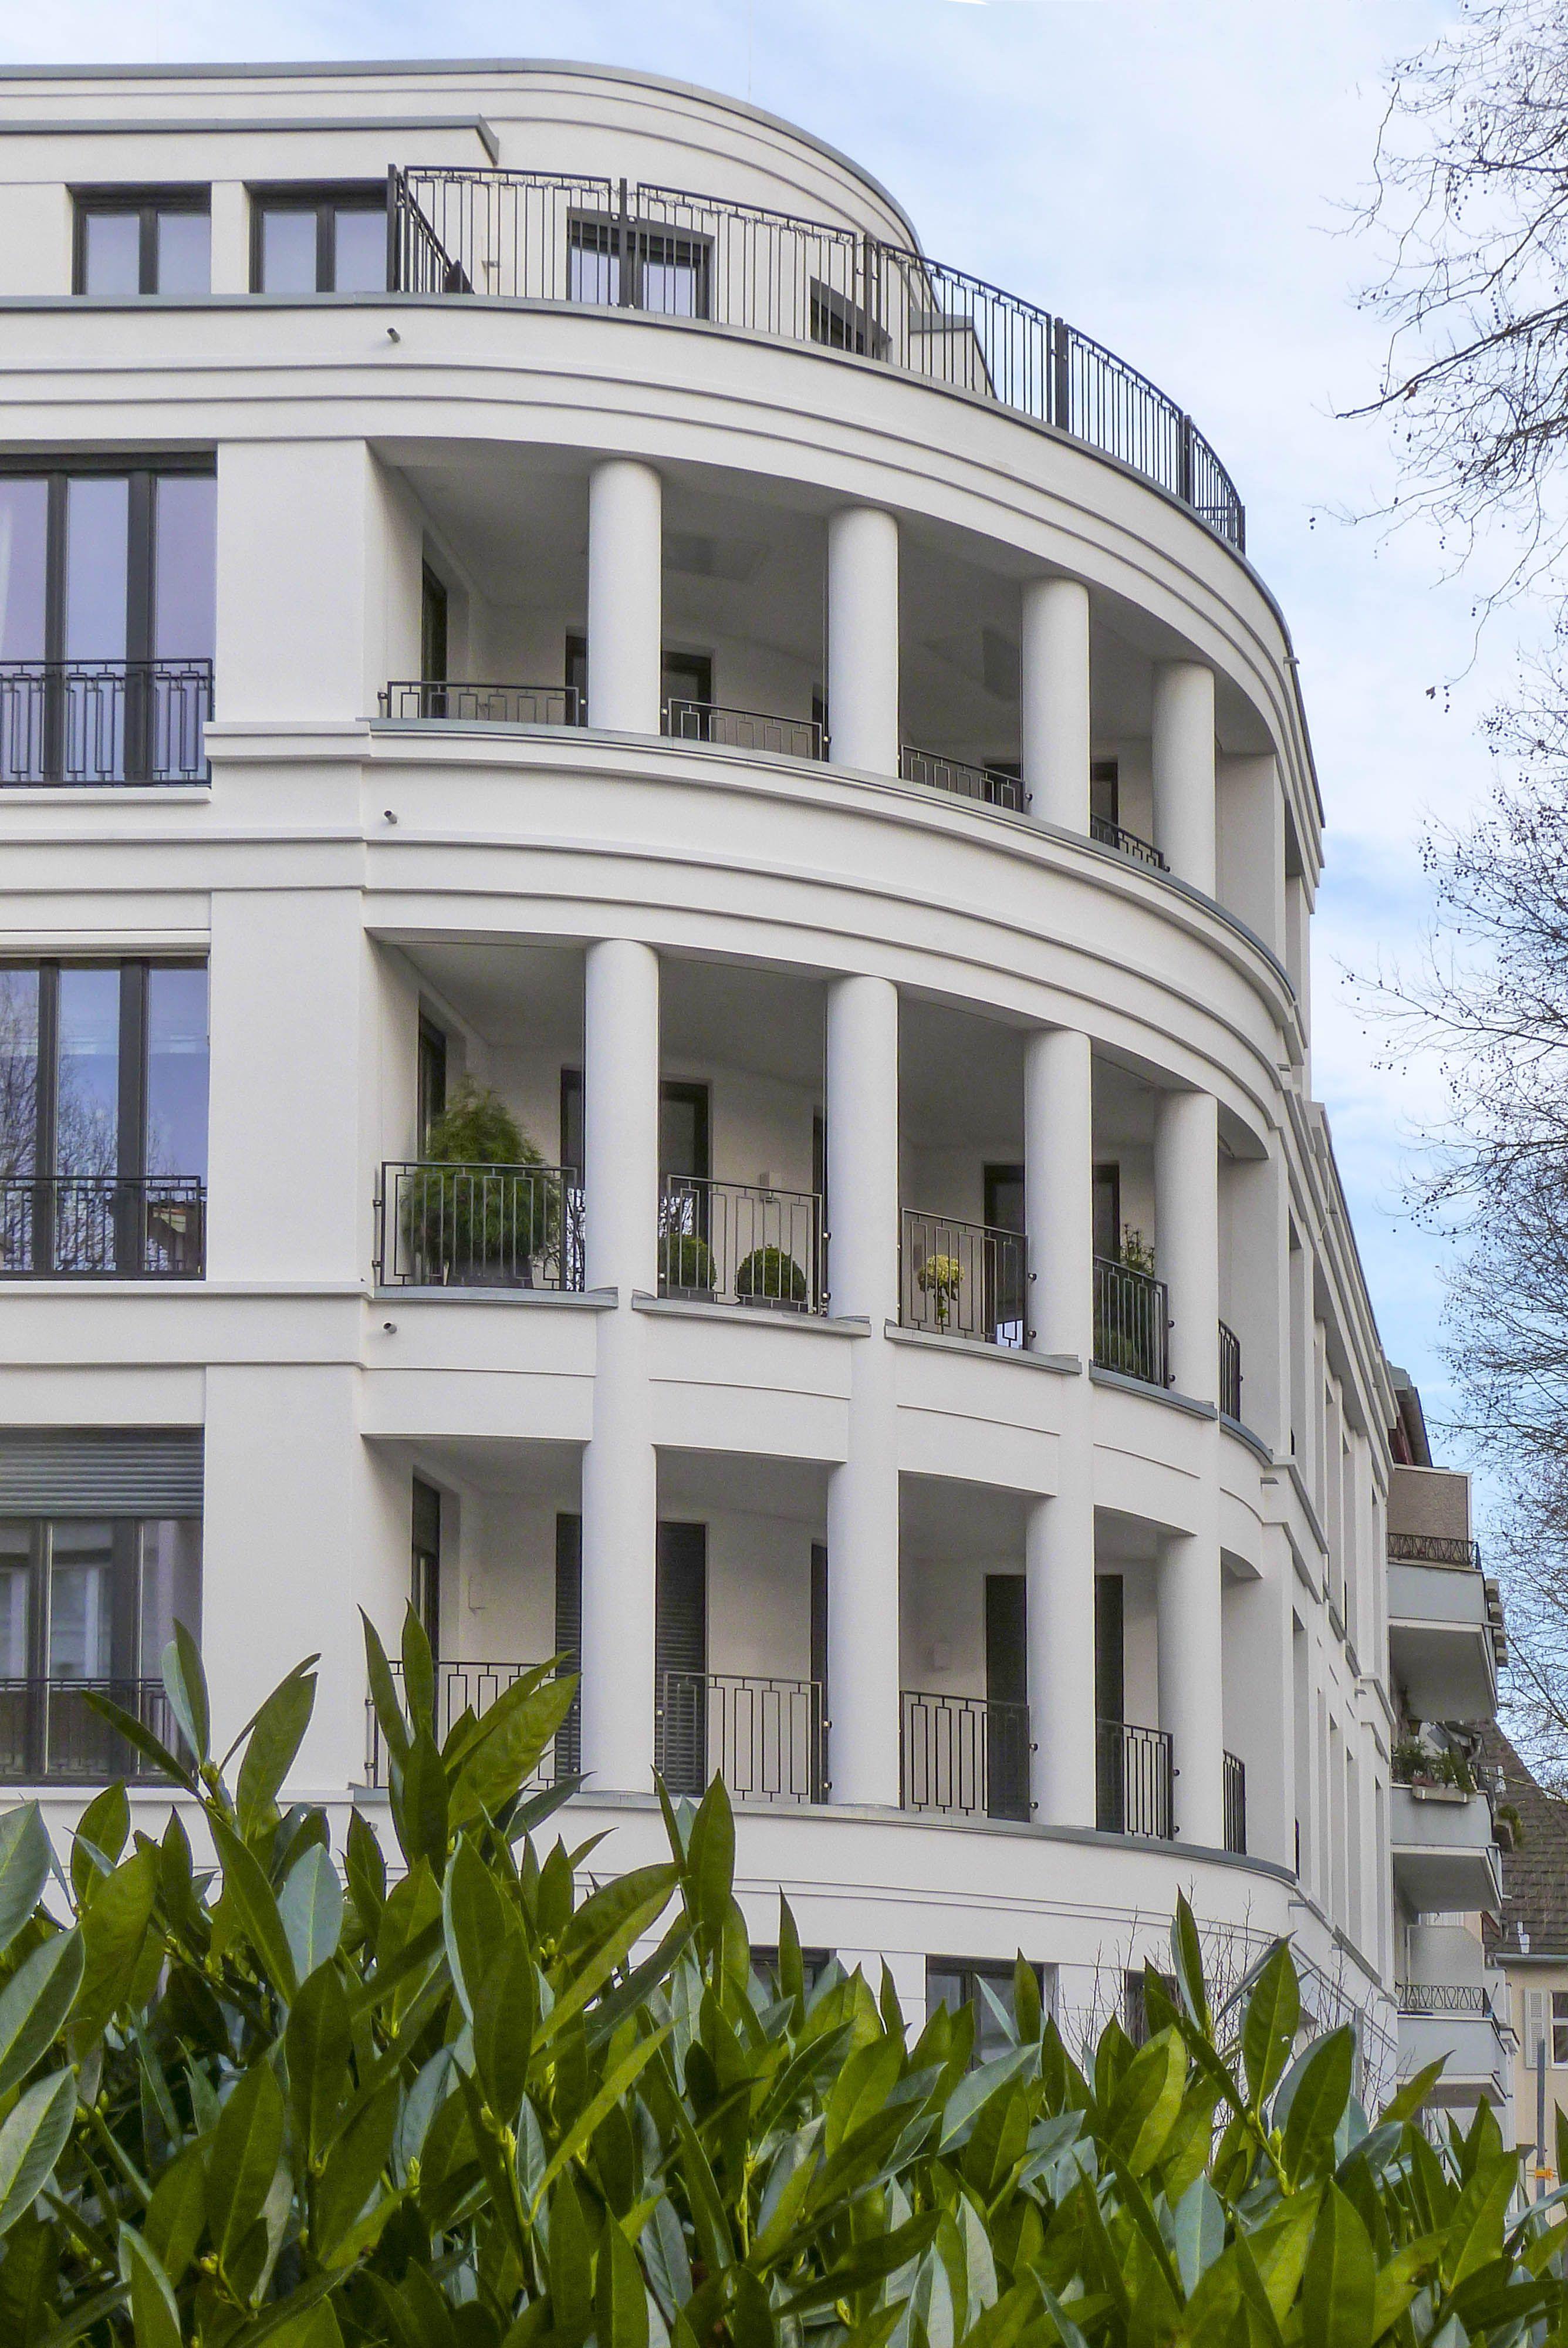 Repräsentatives Mehrfamilienhaus in Düsseldorf